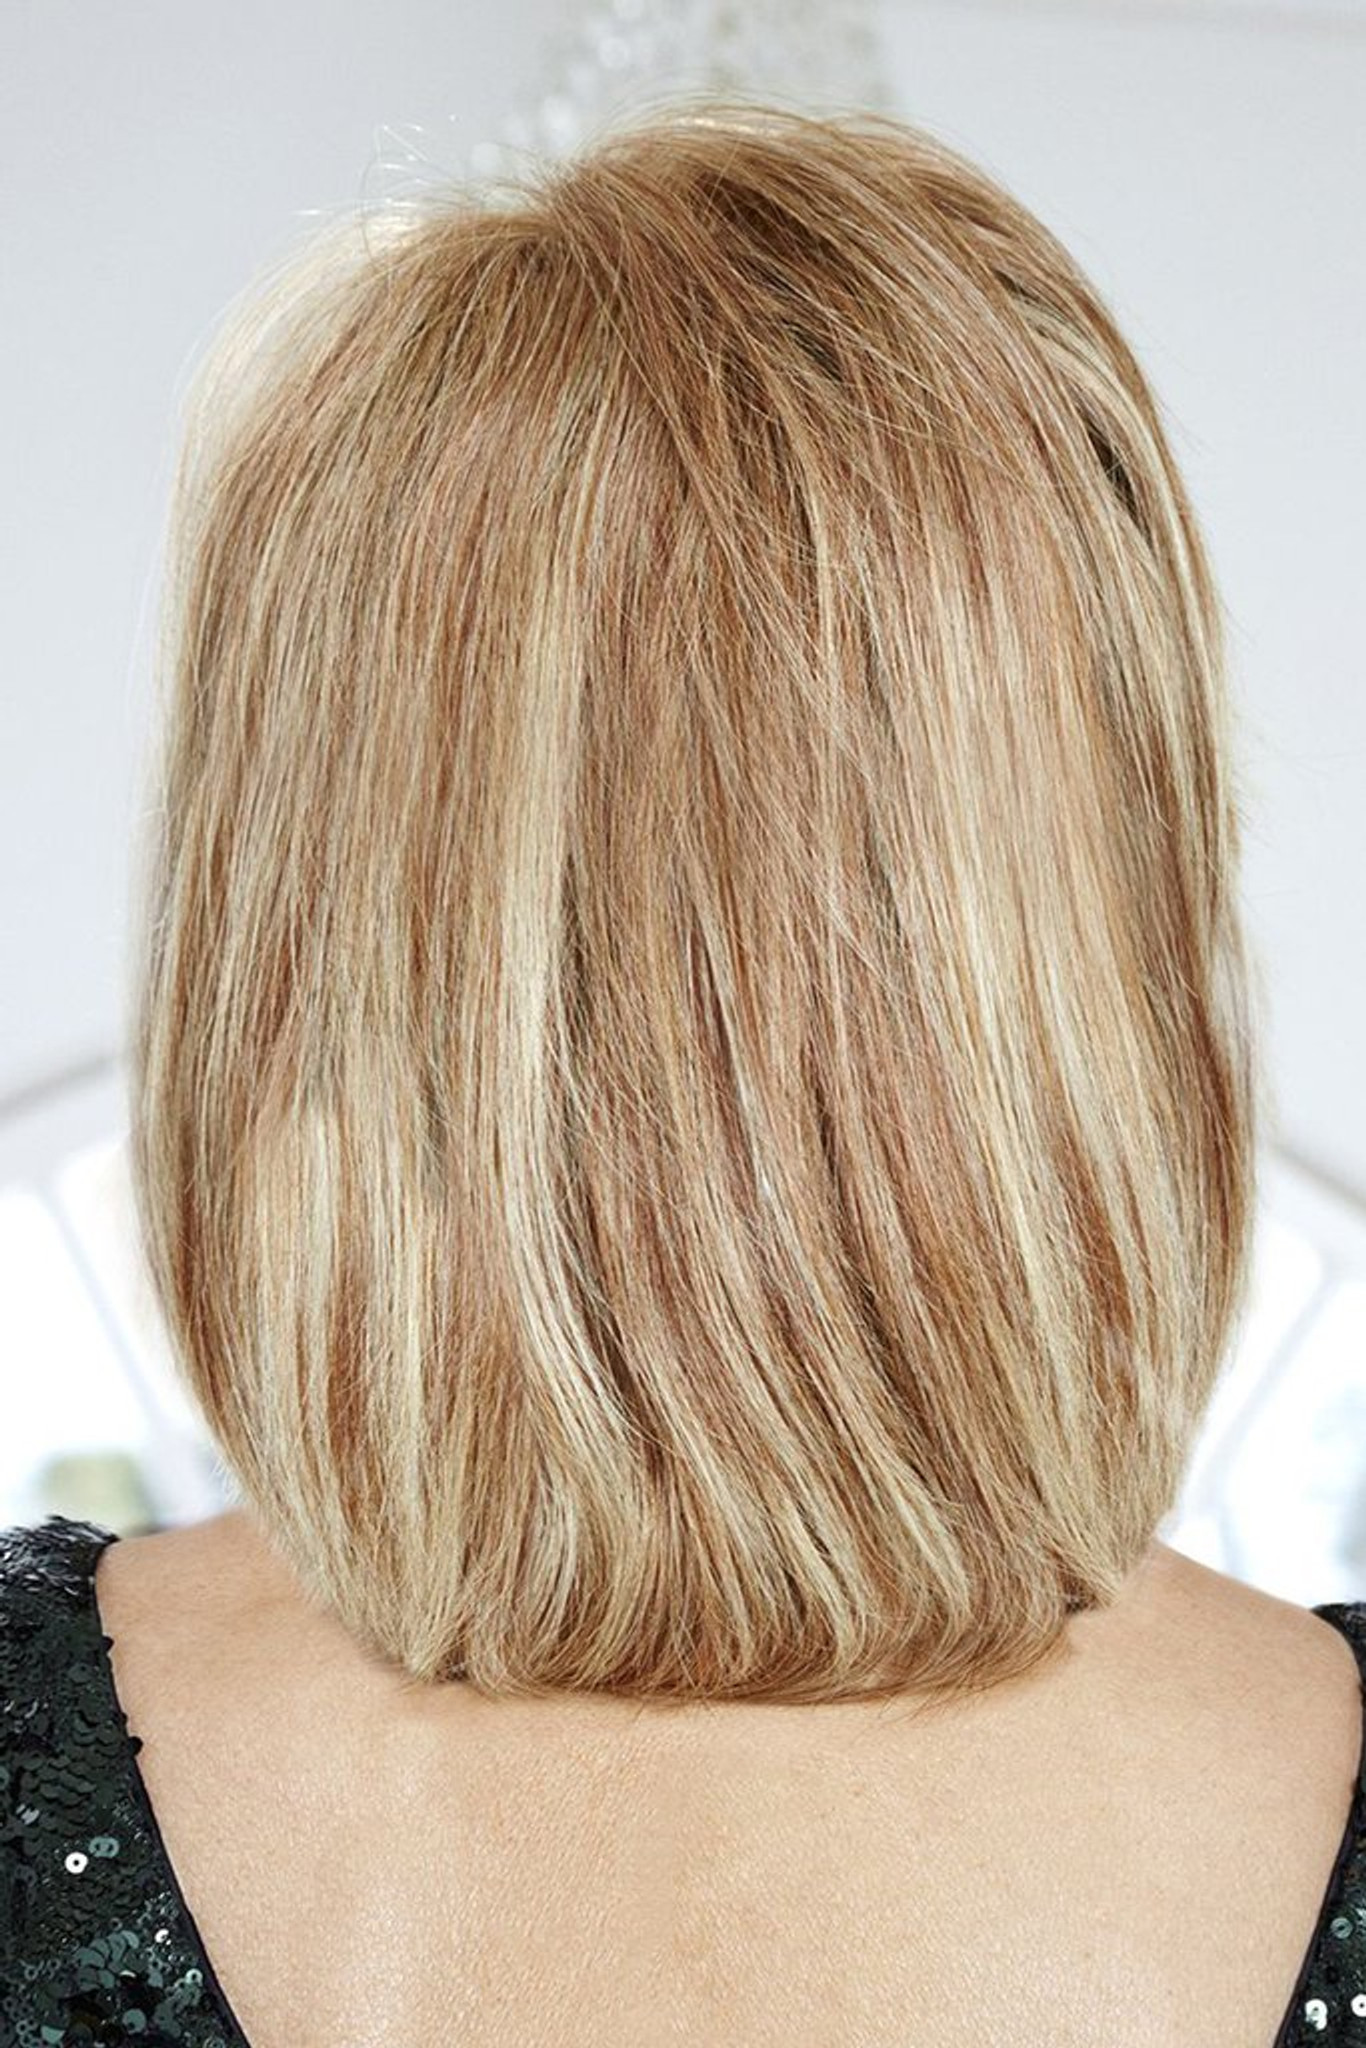 Savoir Faire Raquel Welch Wigs Back View